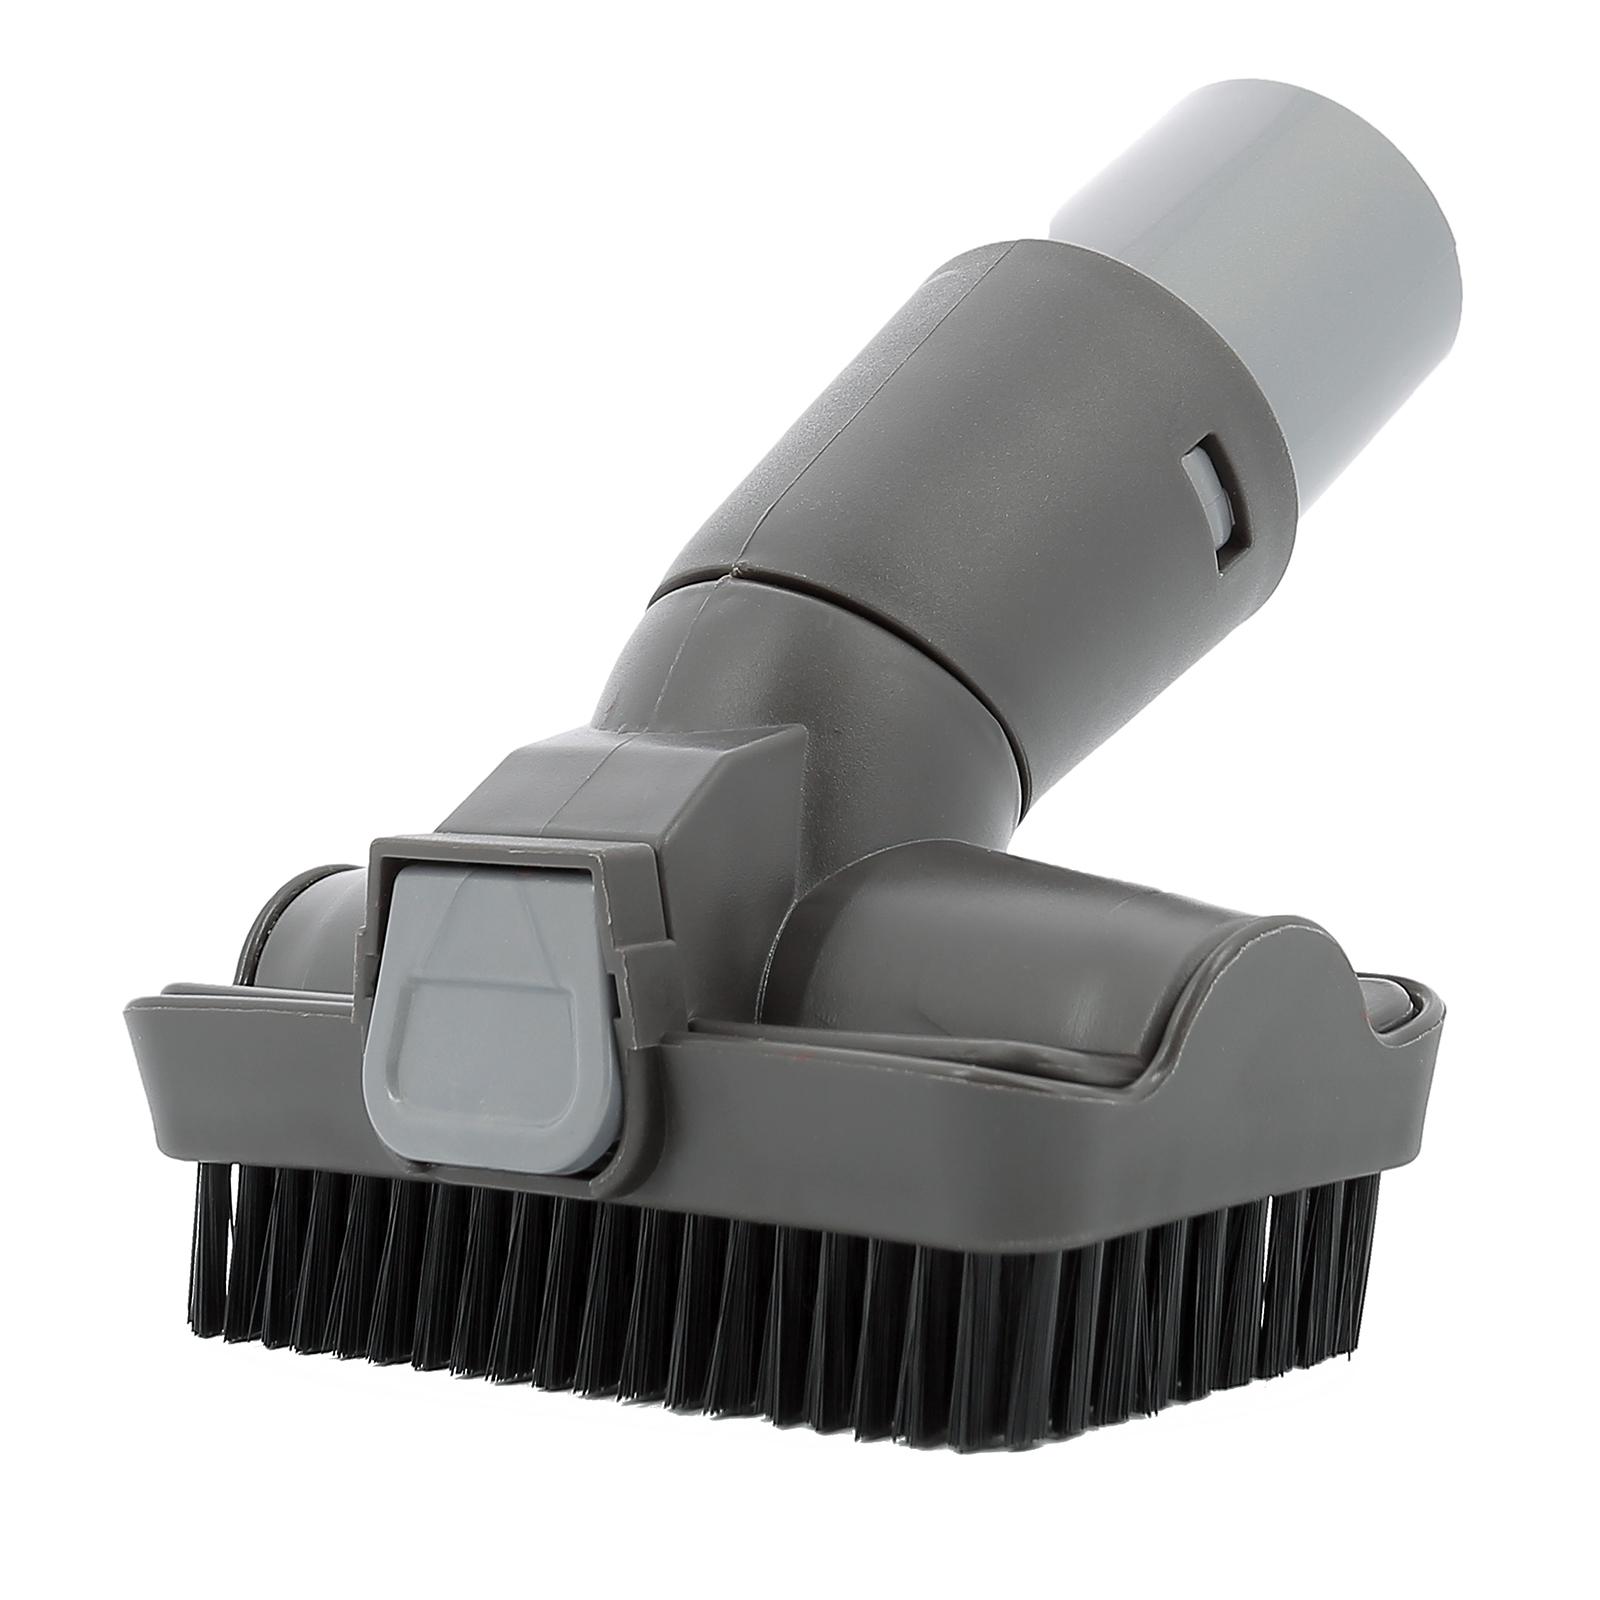 Professional Dusting Brush Upholstery Crevice Mini Tool Kit Bag for SHARK Vacuum